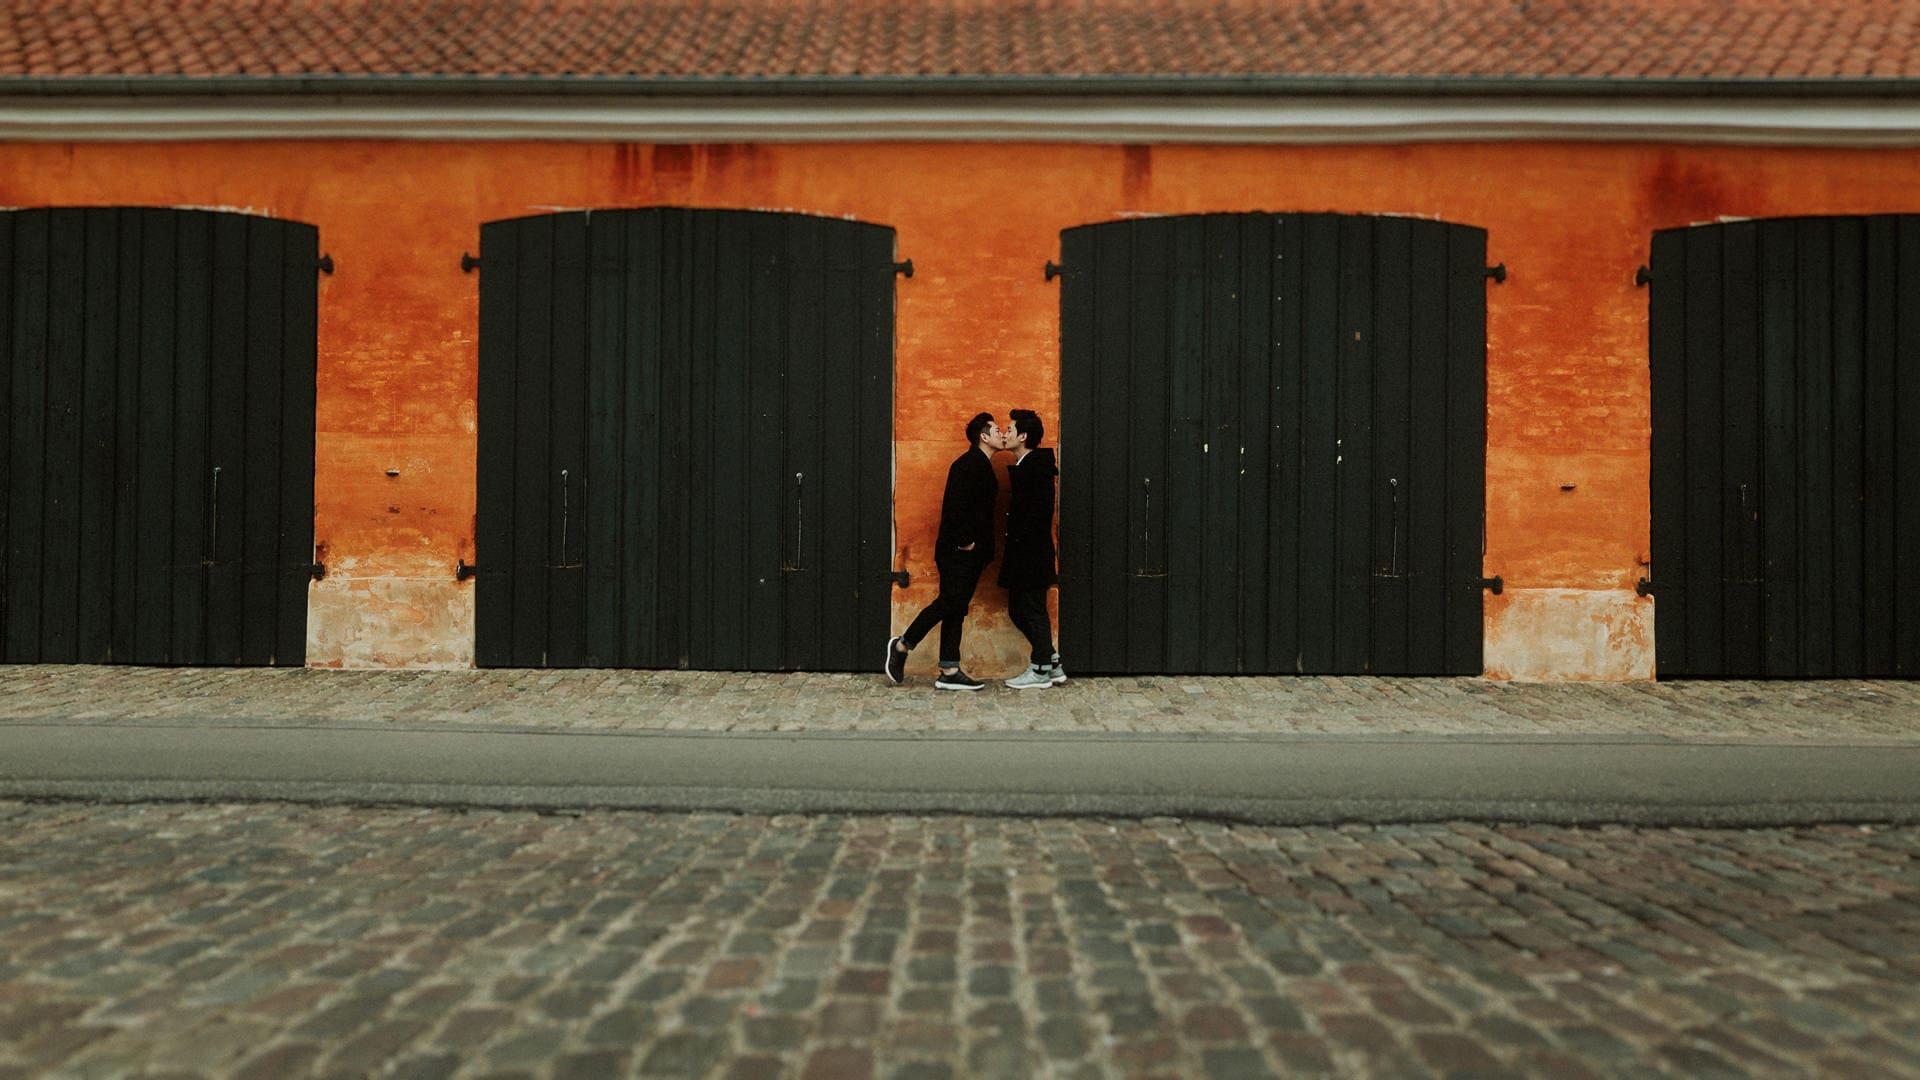 Kopenhagen Destination Wedding Photographer Denmark Lgbtq Samesex Elopement 0004